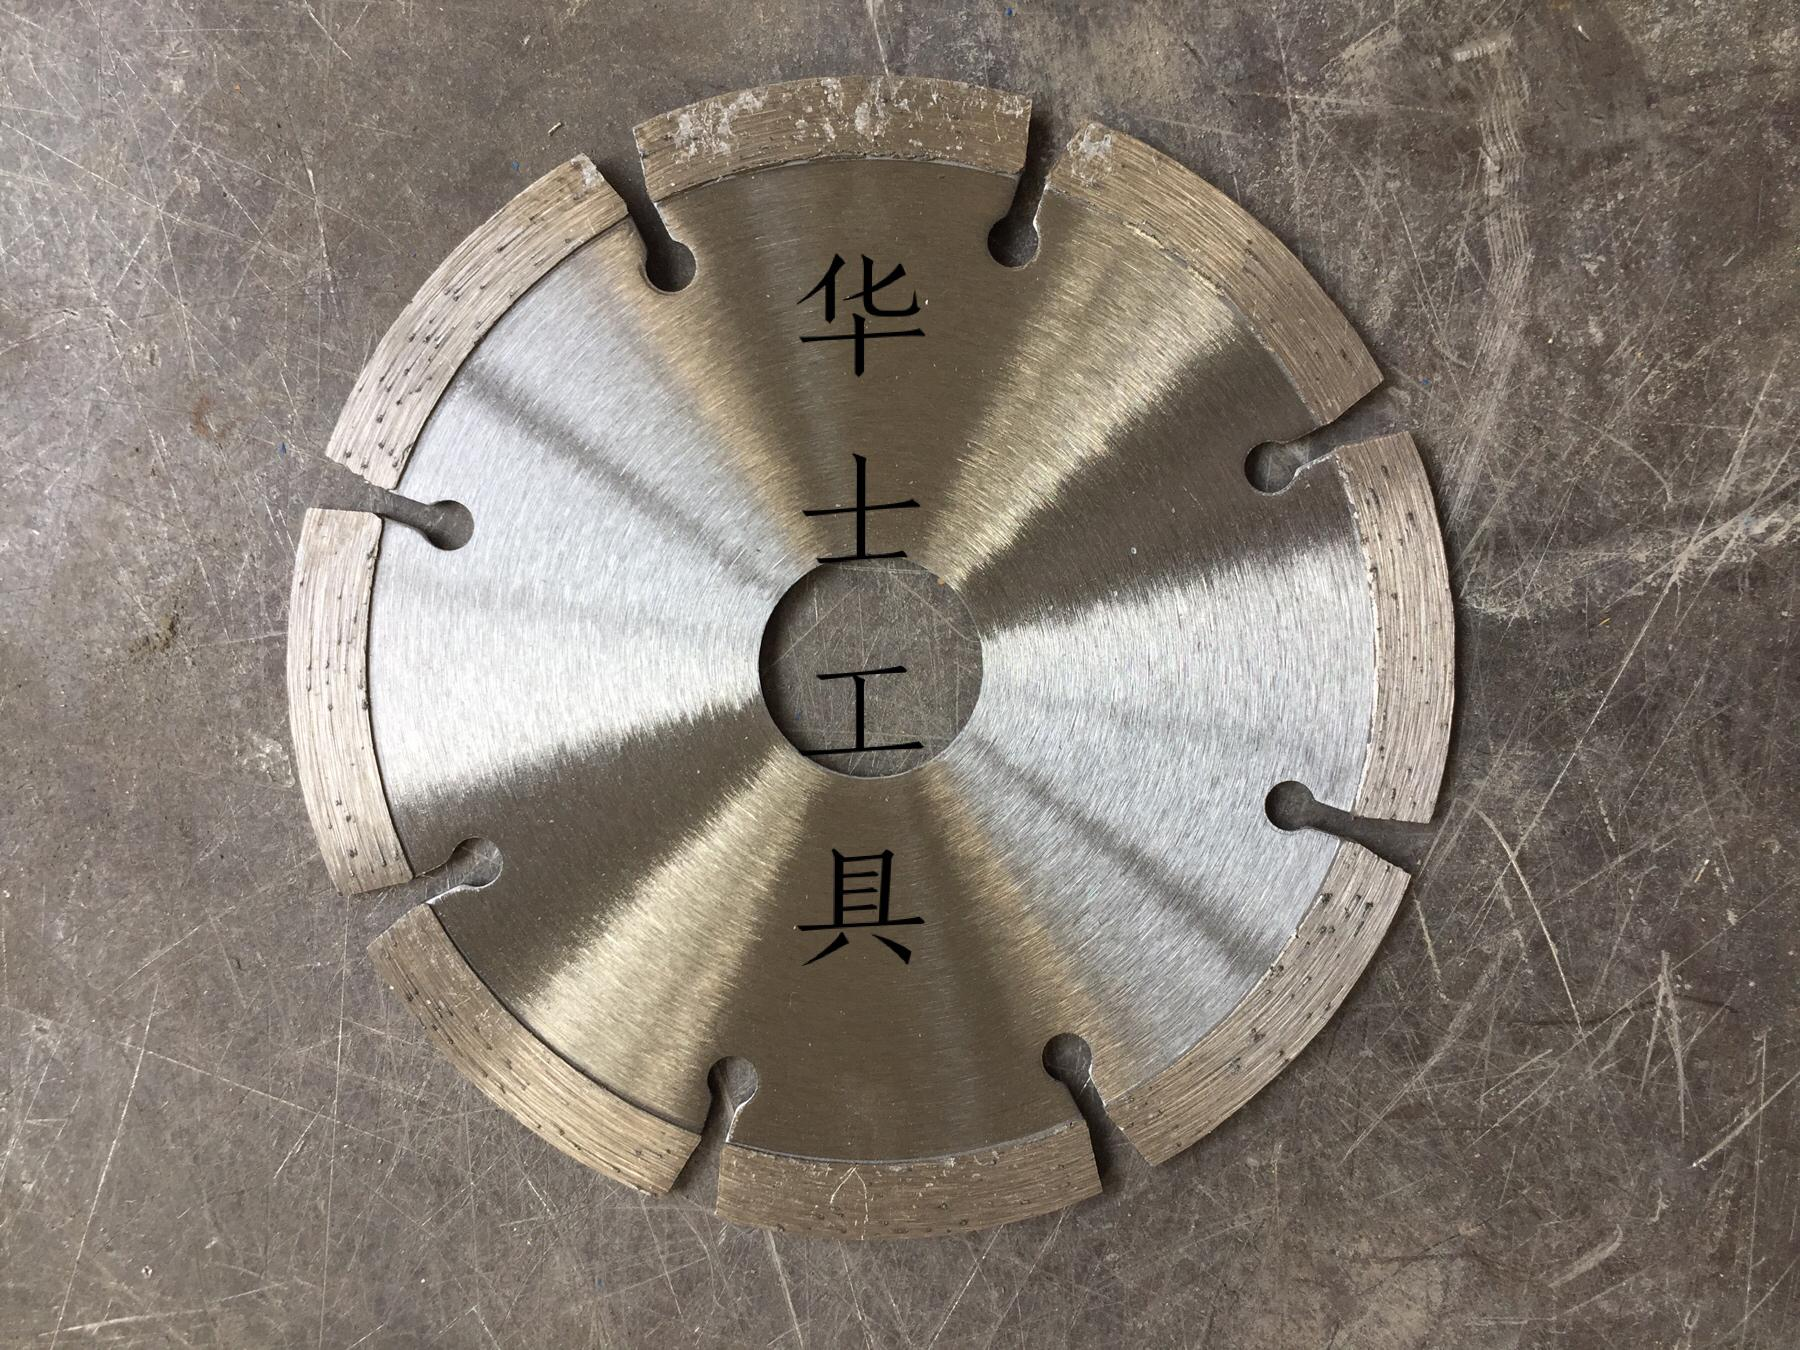 Concrete-Segmented saw blade